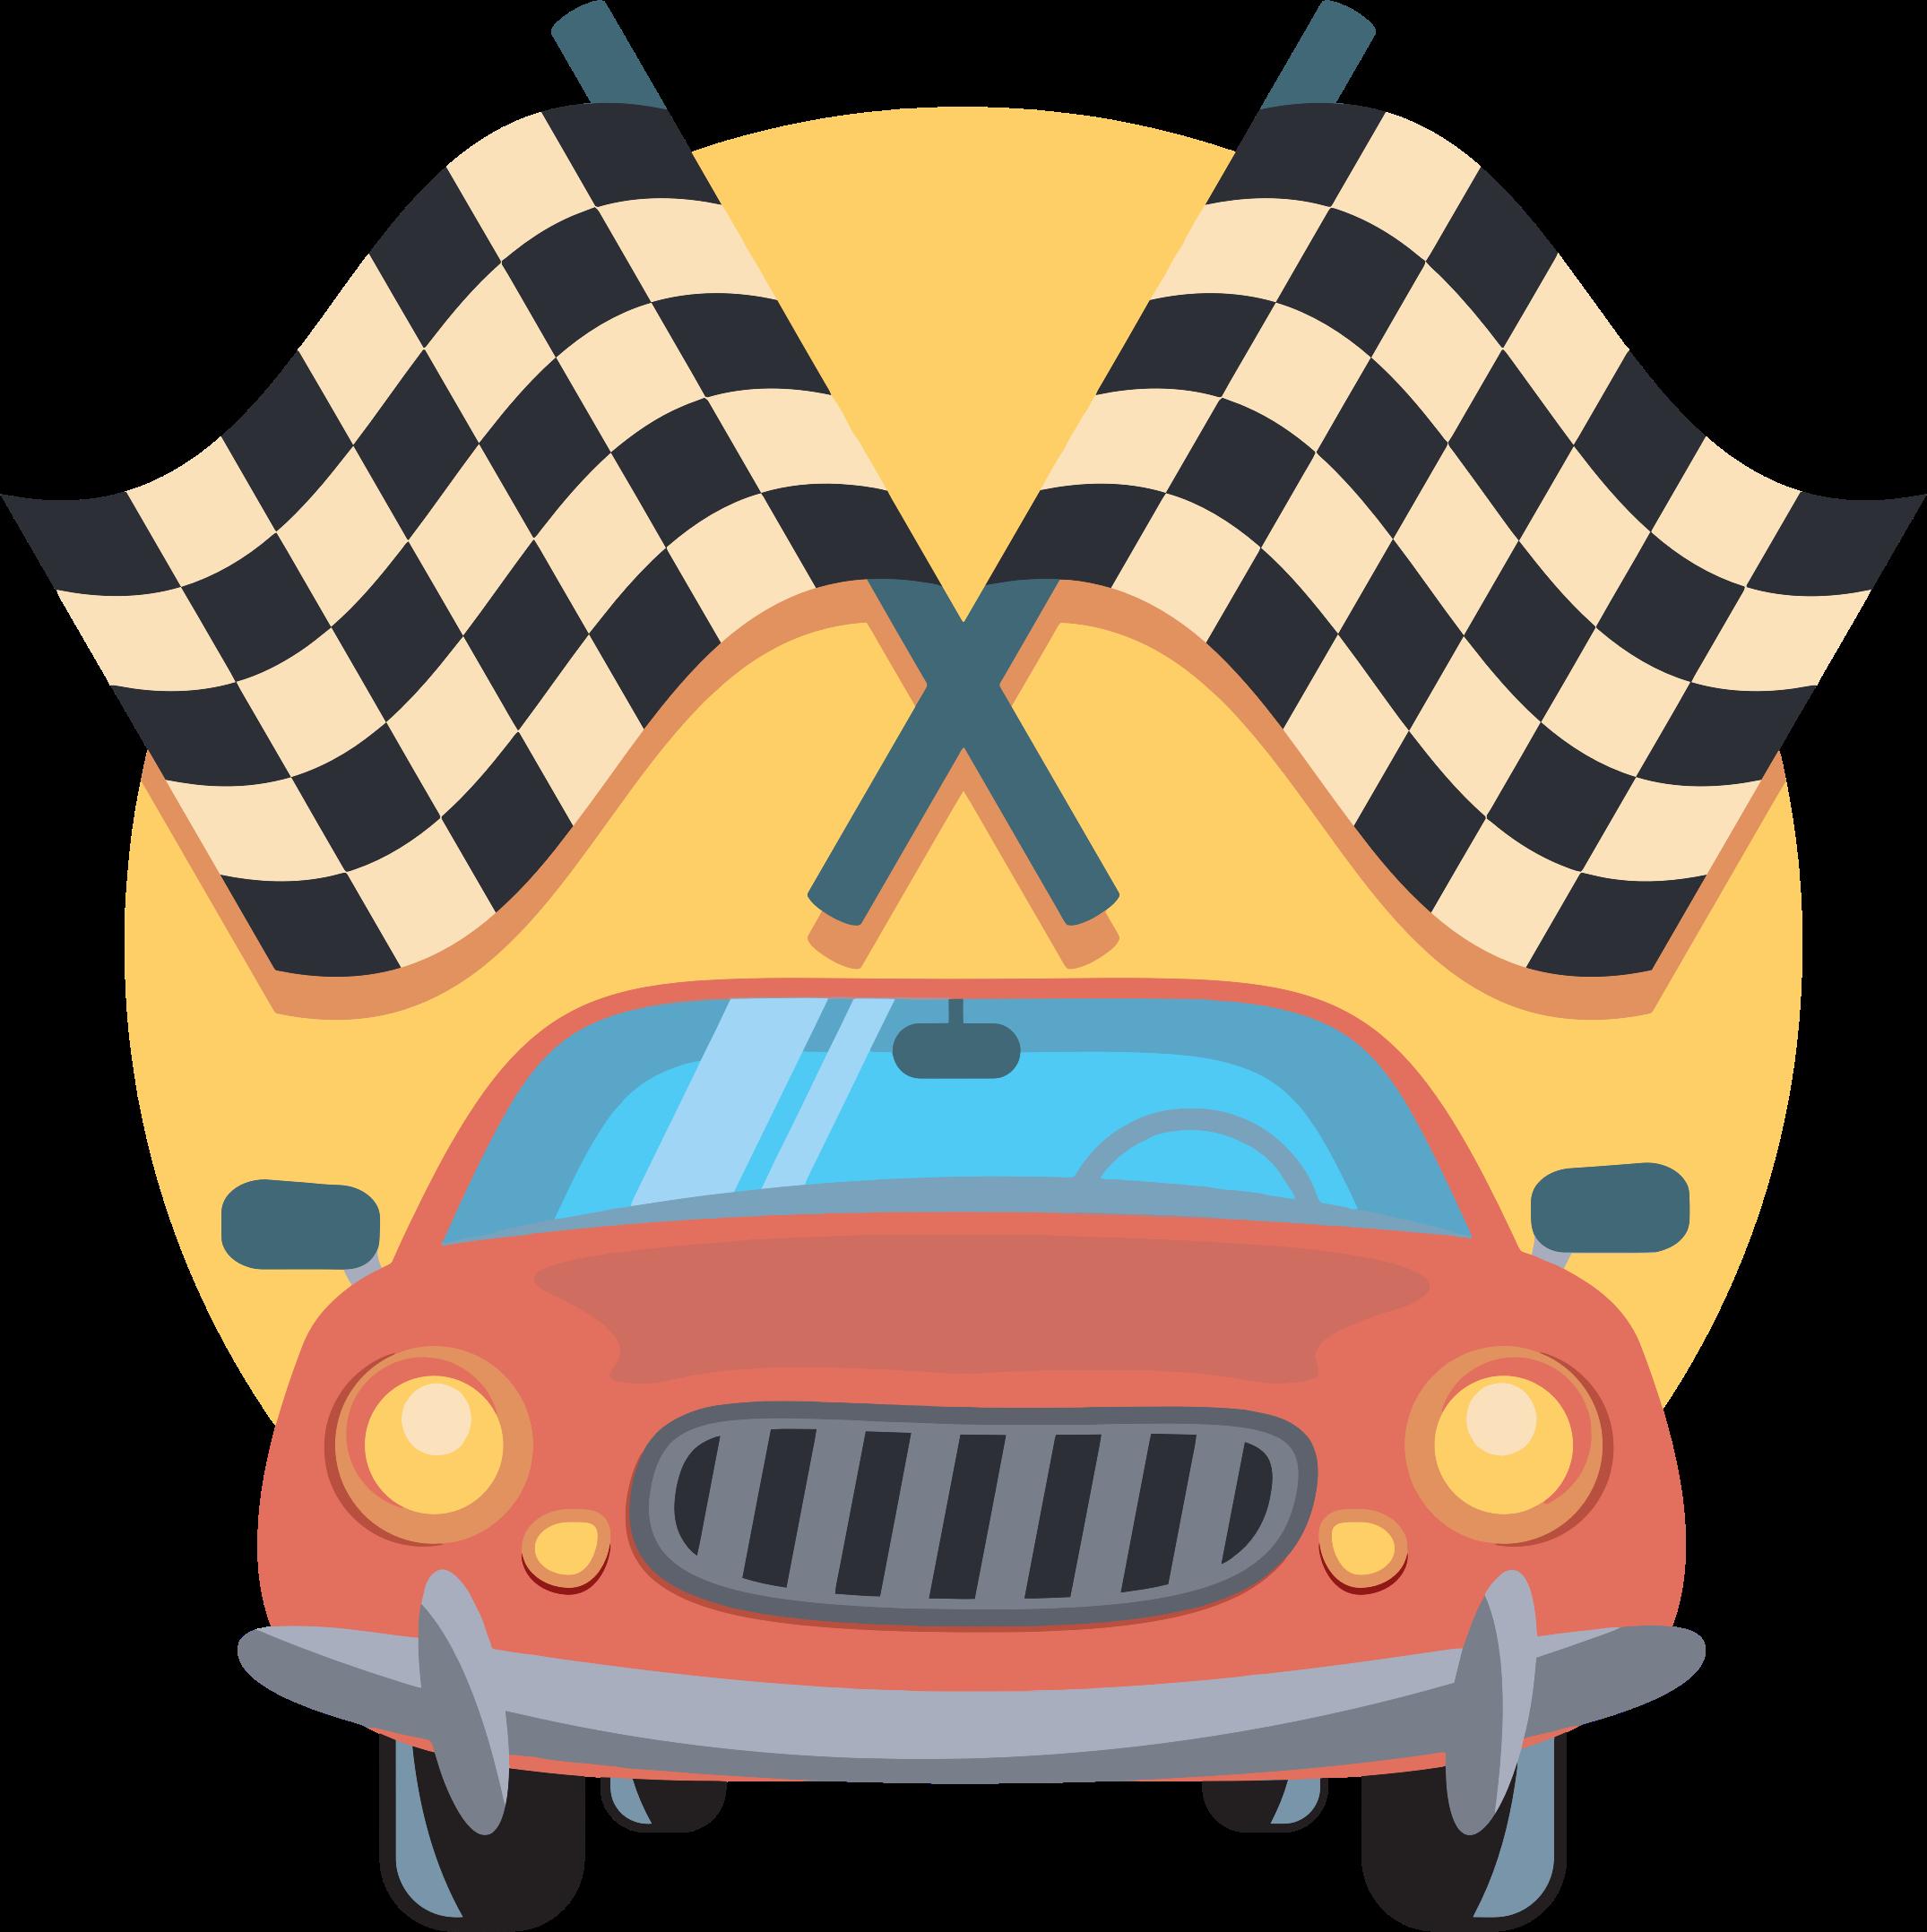 Free Nascar Clipart slot car racing, Download Free Clip Art.